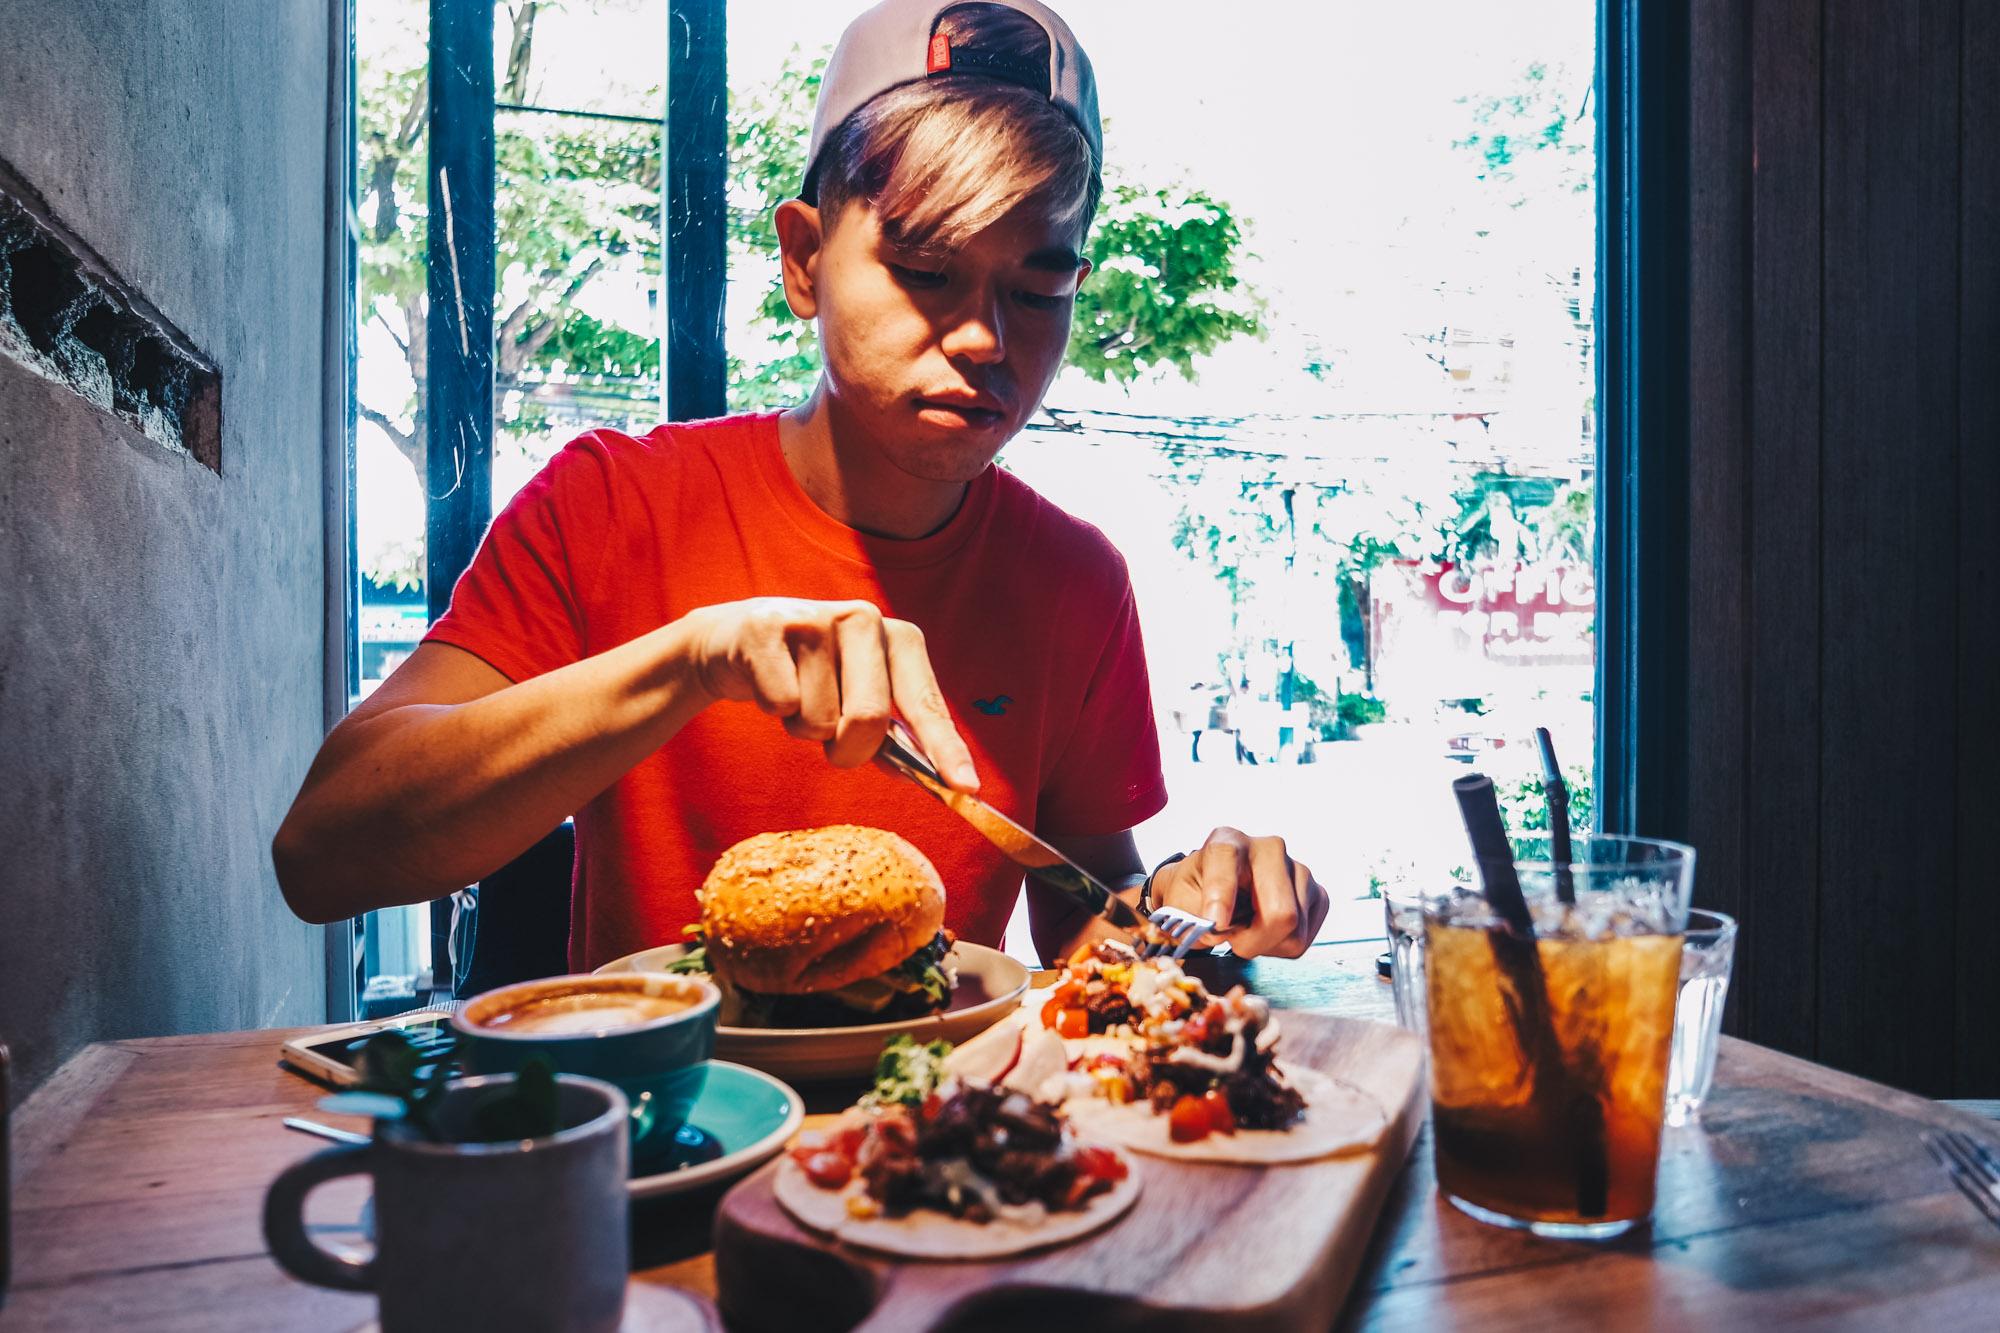 luka-cafe-bangkok-darrenbloggie-5253